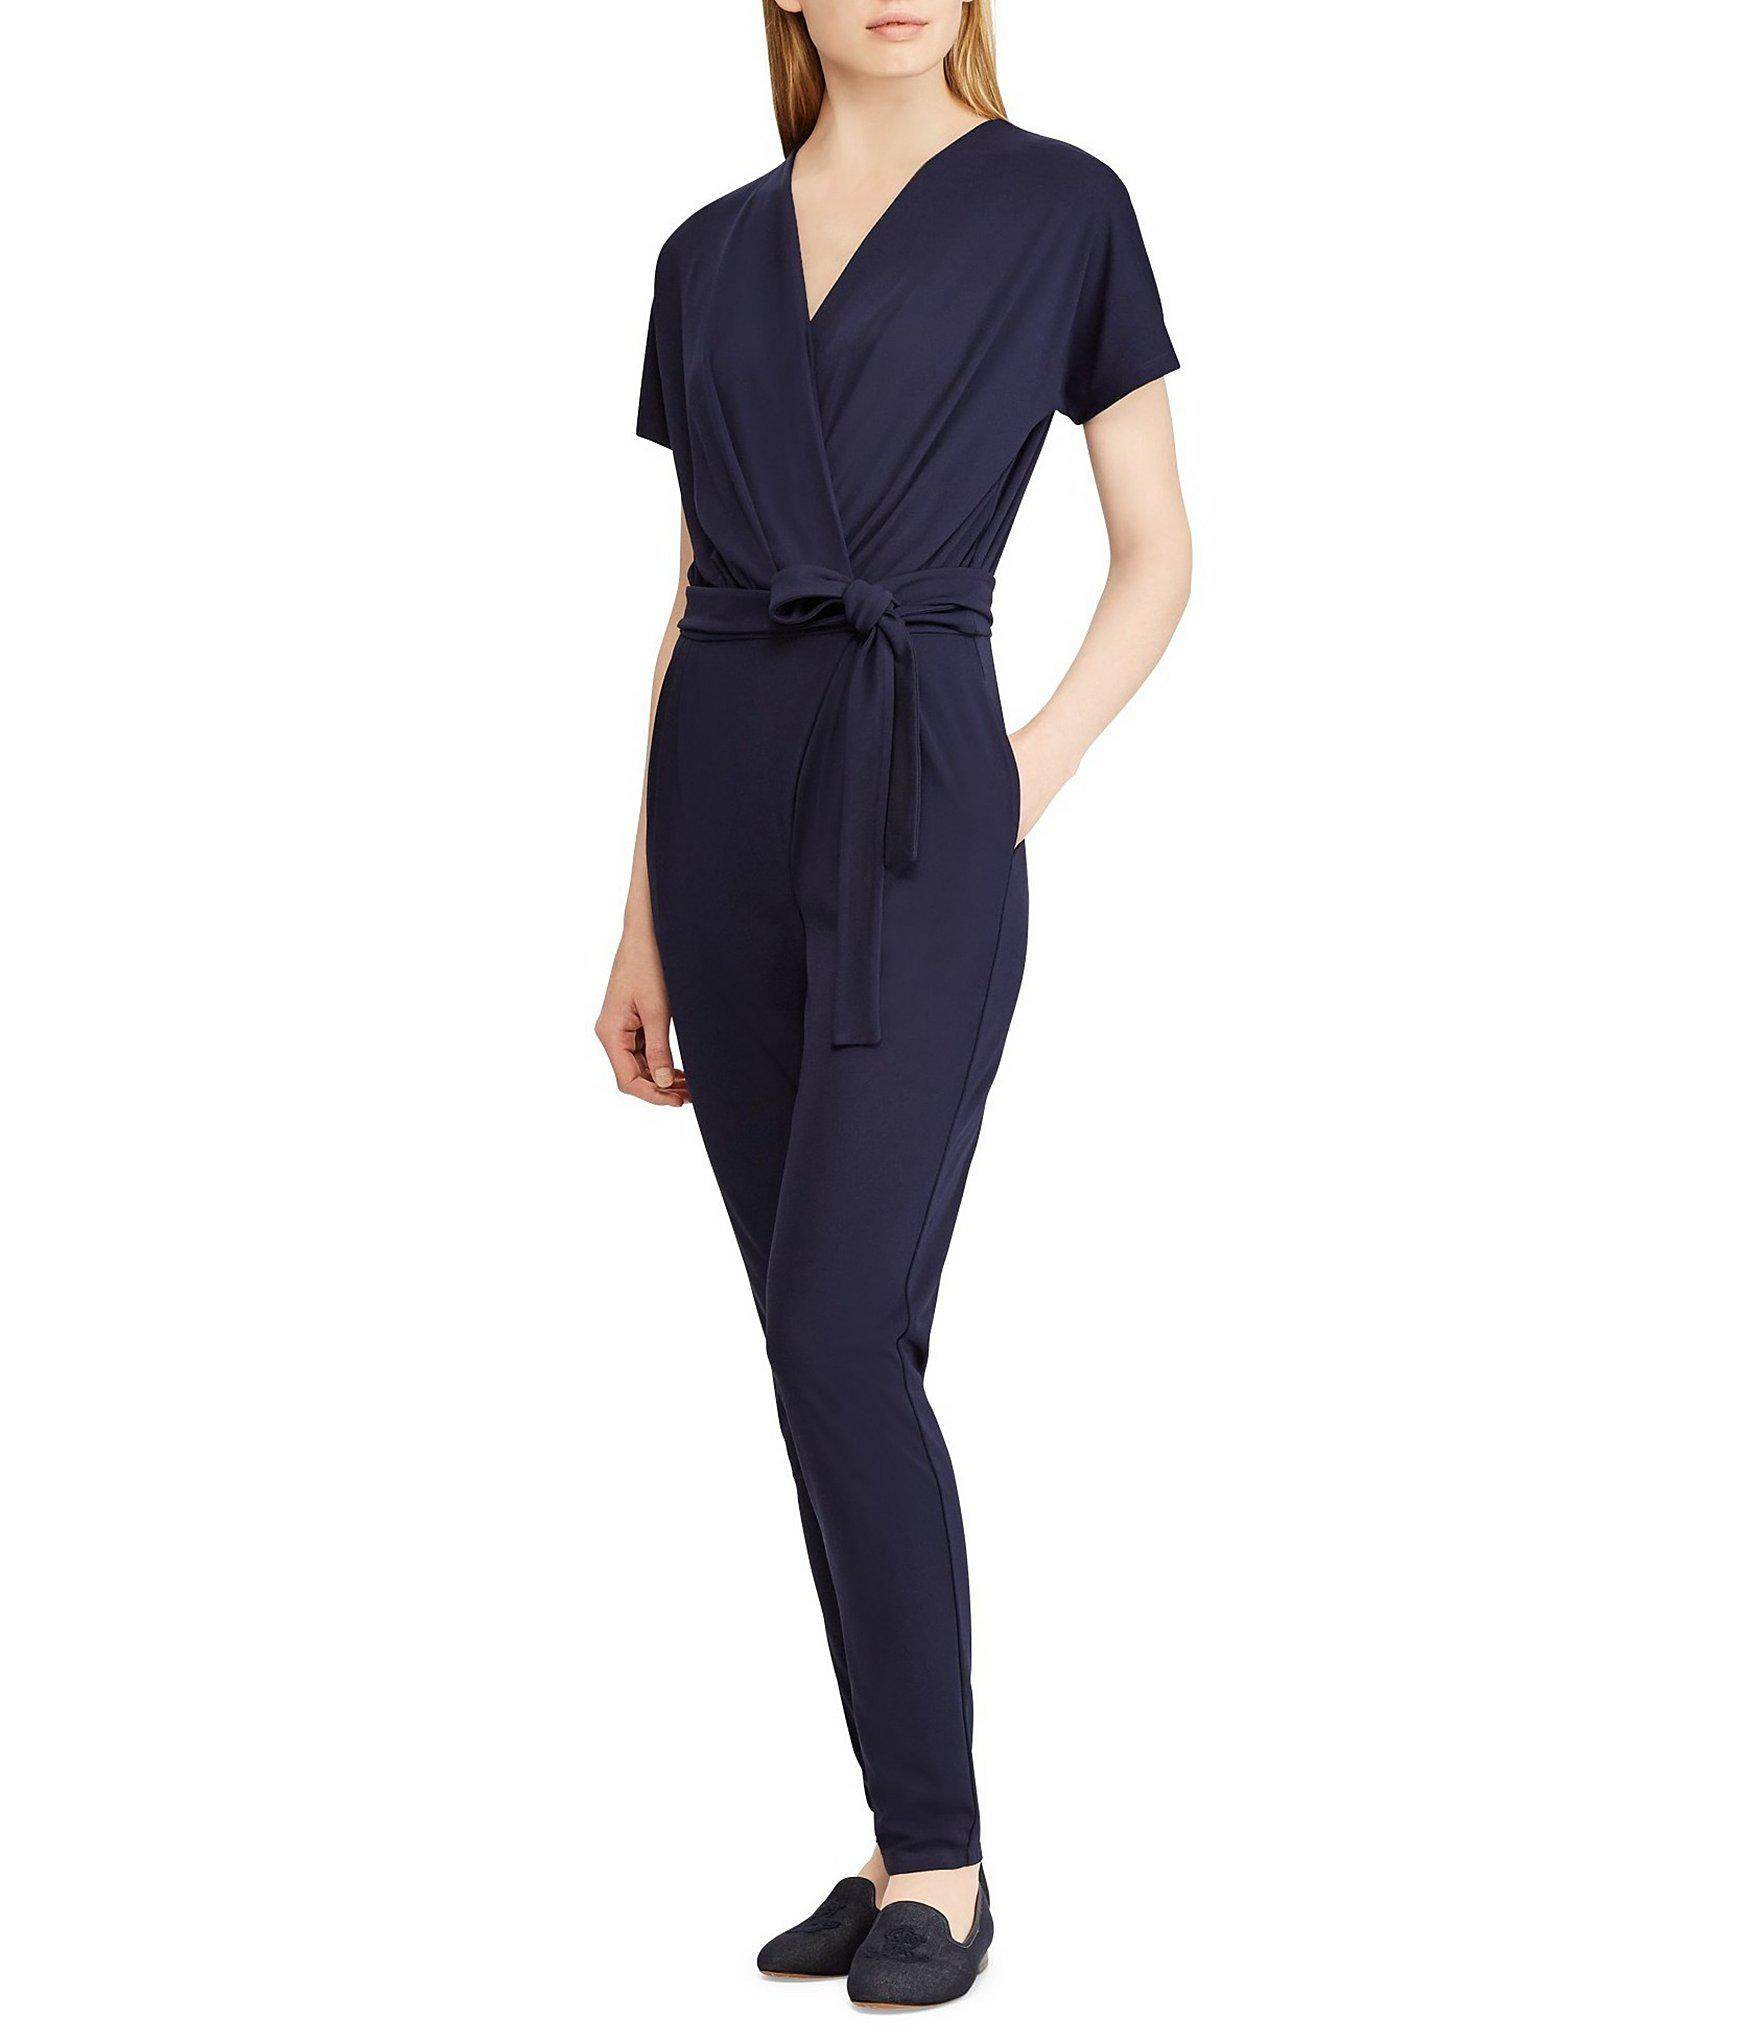 6c96a0862f57 Lyst - Lauren By Ralph Lauren Matte Jersey Surplice Jumpsuit in Blue